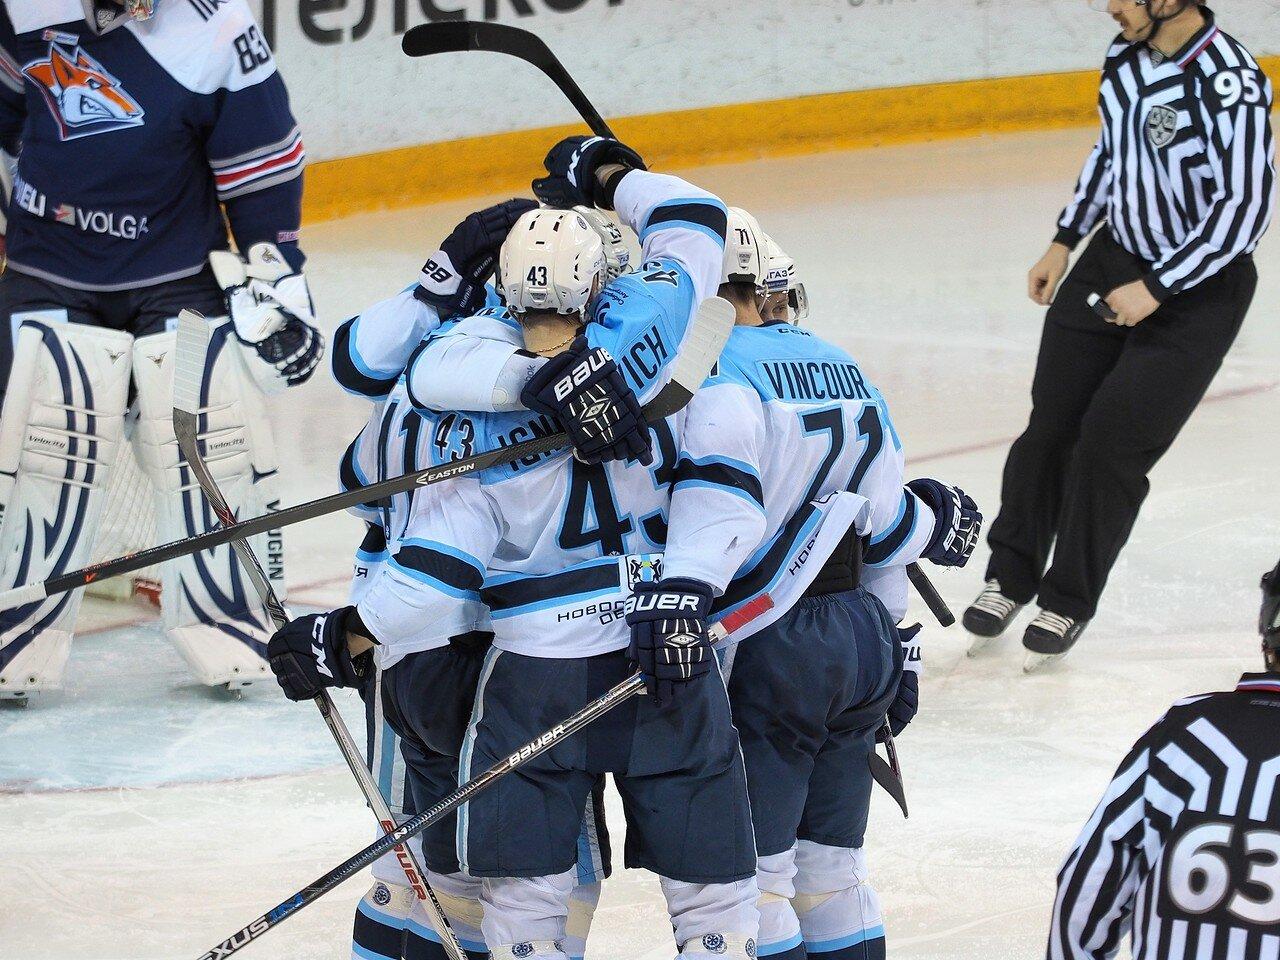 84Плей-офф 2016 Восток 1/2 Металлург - Сибирь 10.03.2016